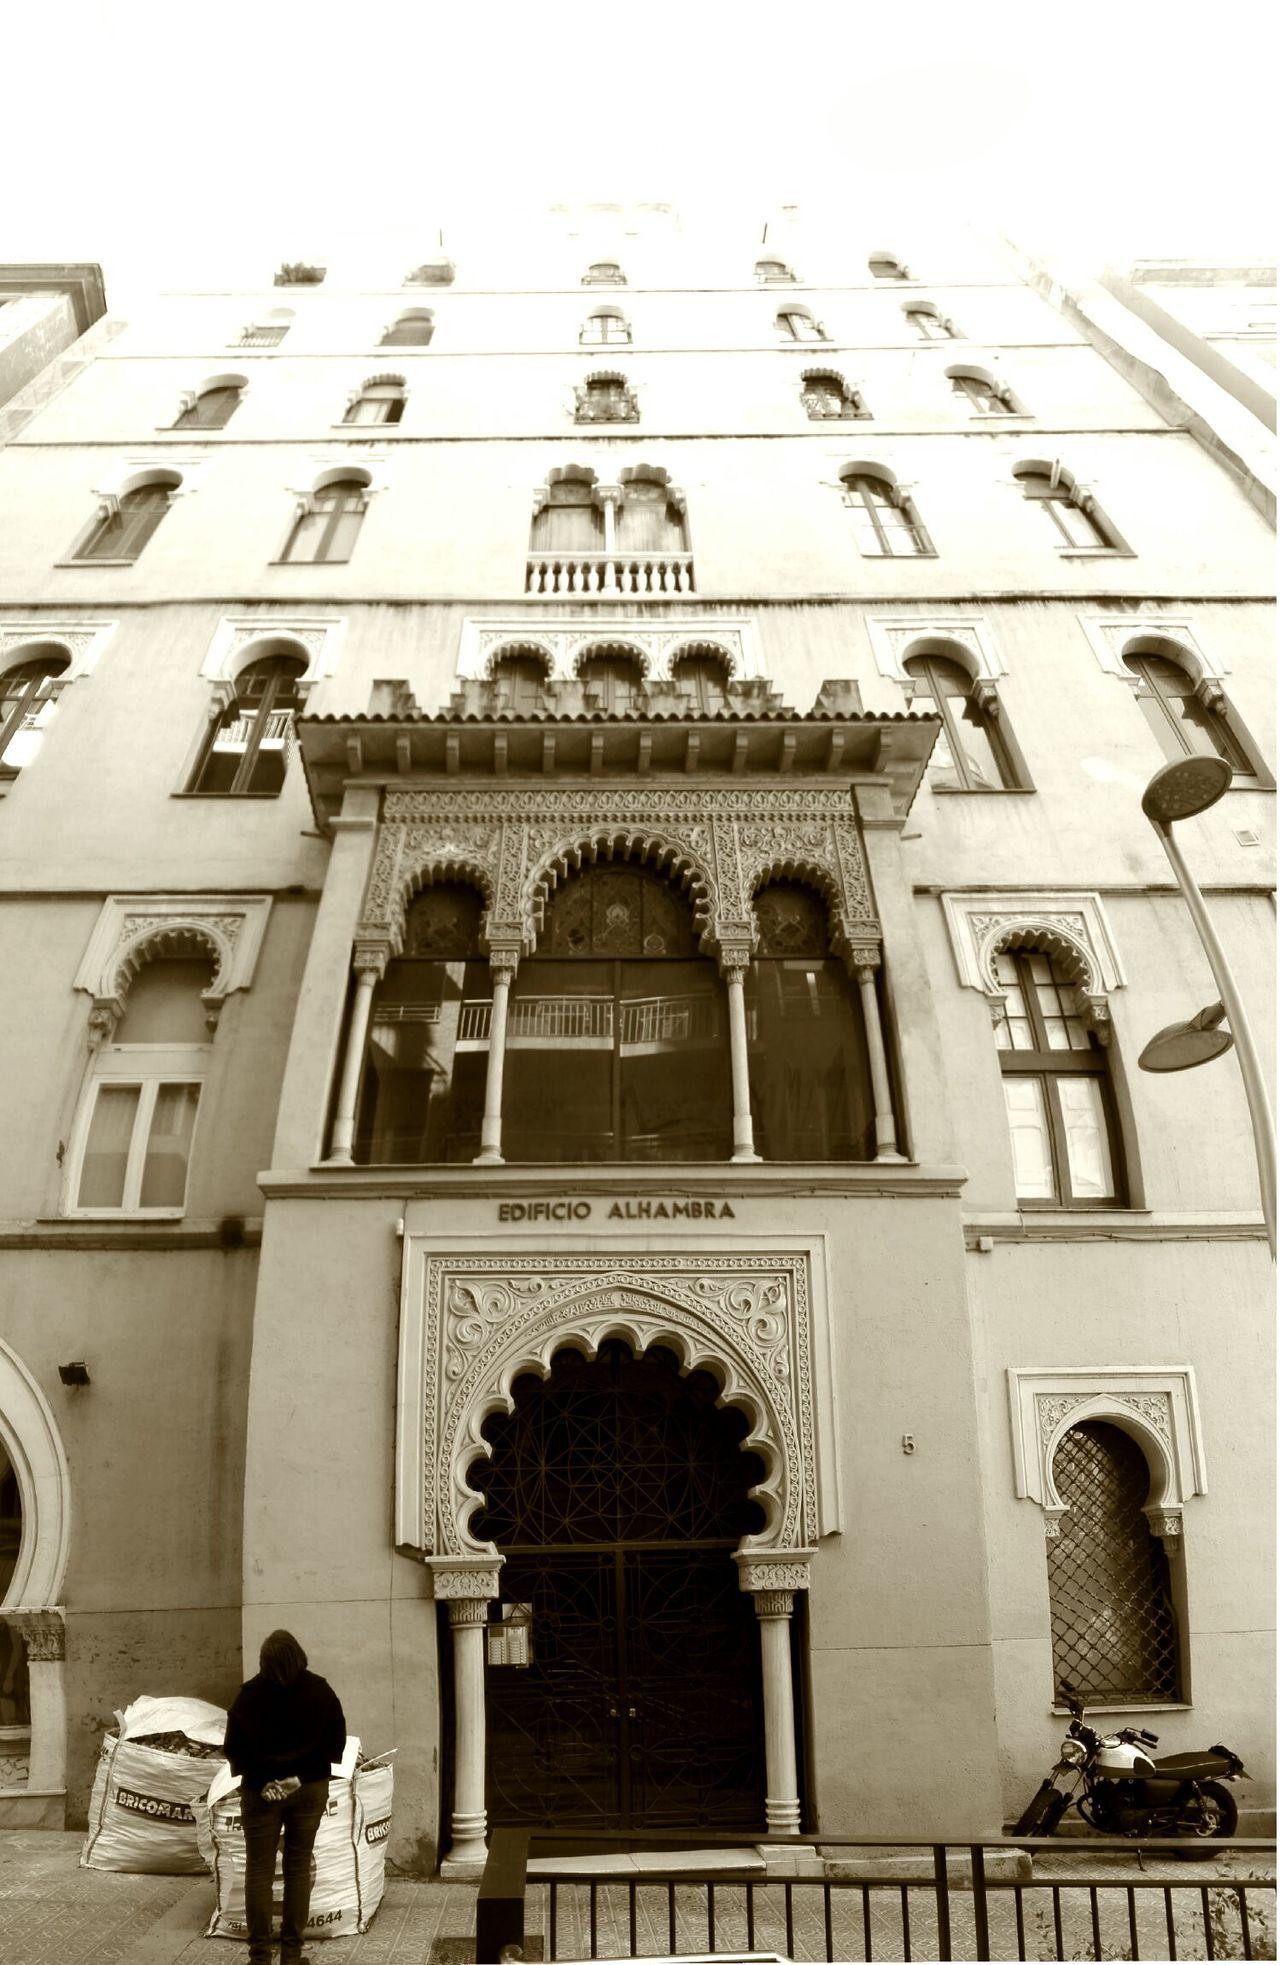 Skyhigh Oriental Architecture Façade Perspective Urban Edificio Alhambra